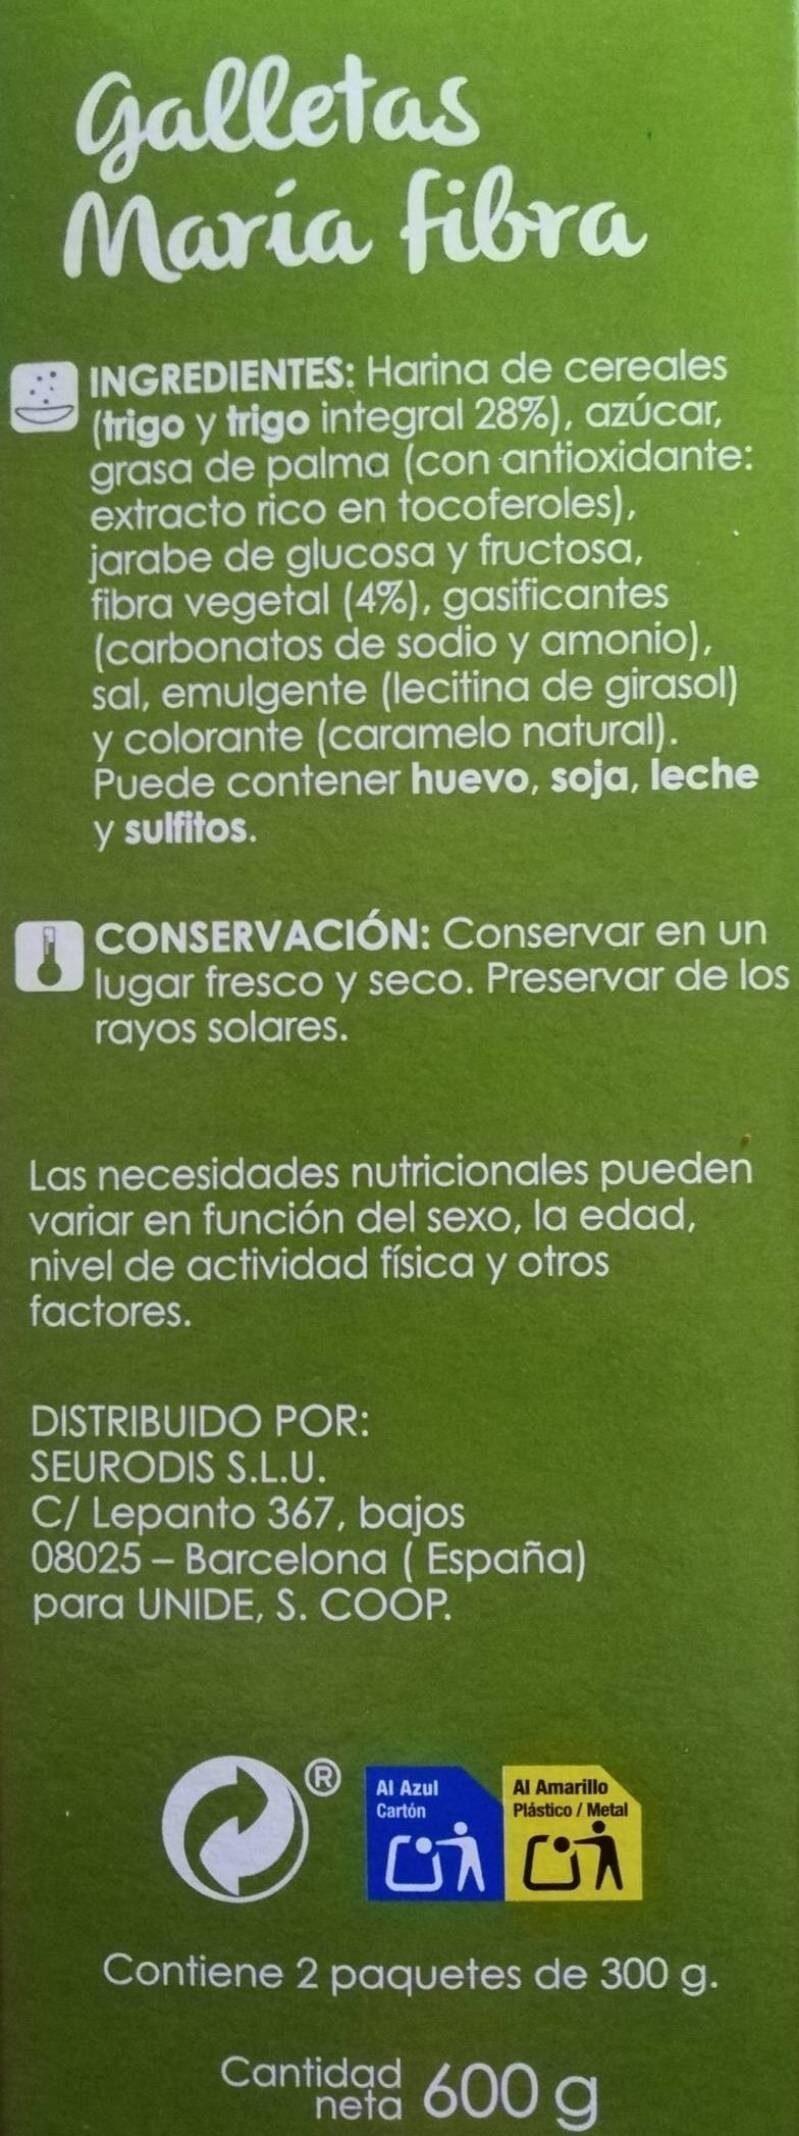 Galletas Maria fibra - Ingredientes